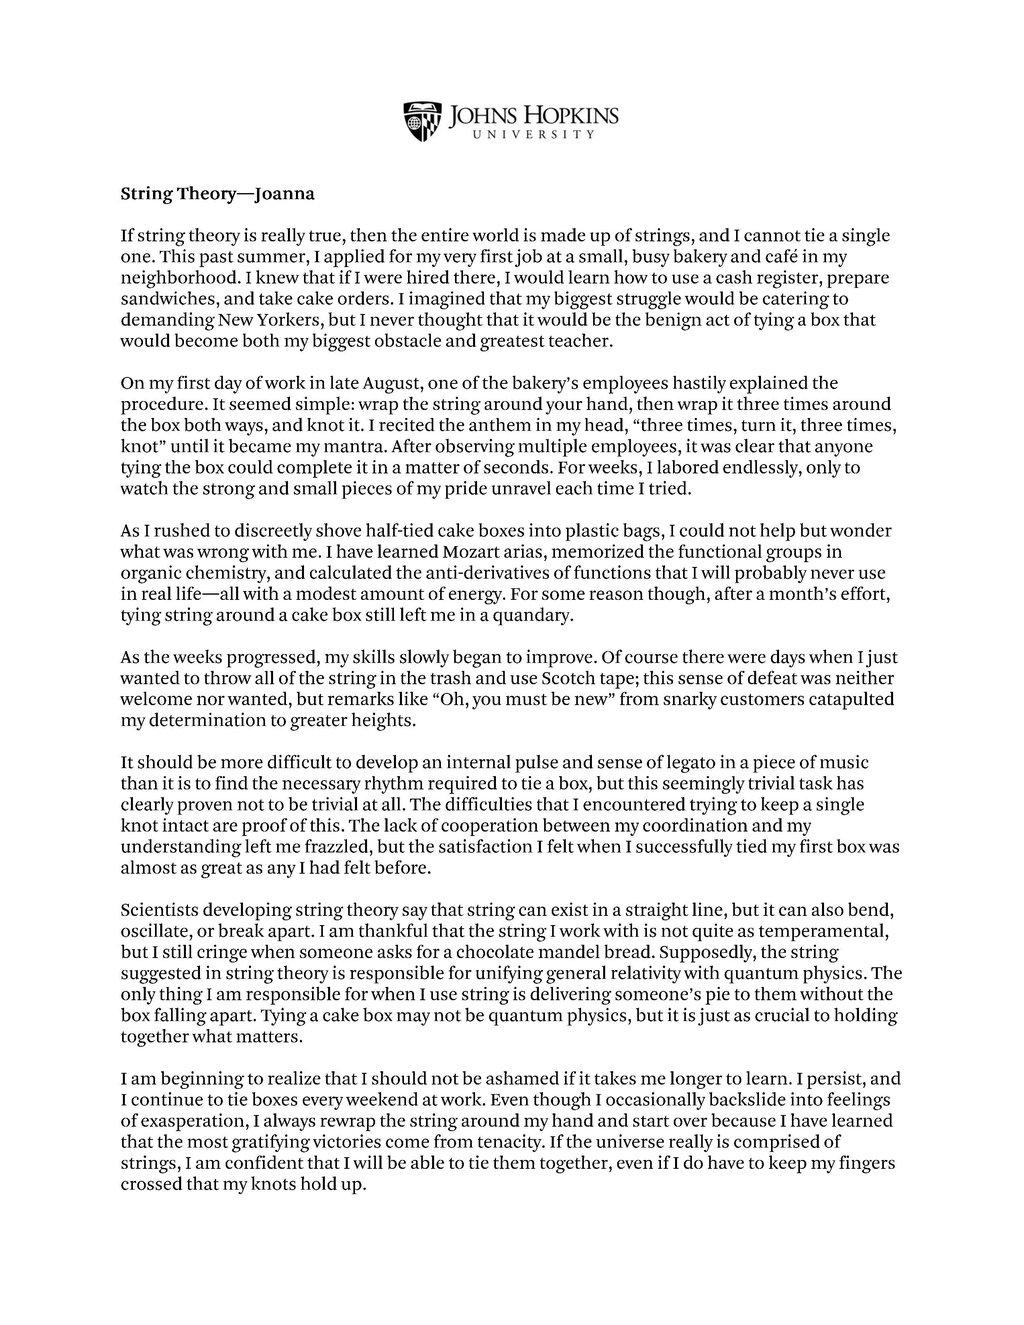 Posting Clerk Resume Professional Mba Essay Writer Site Us Help Me  Persuasive Essay Topics Outline Tips